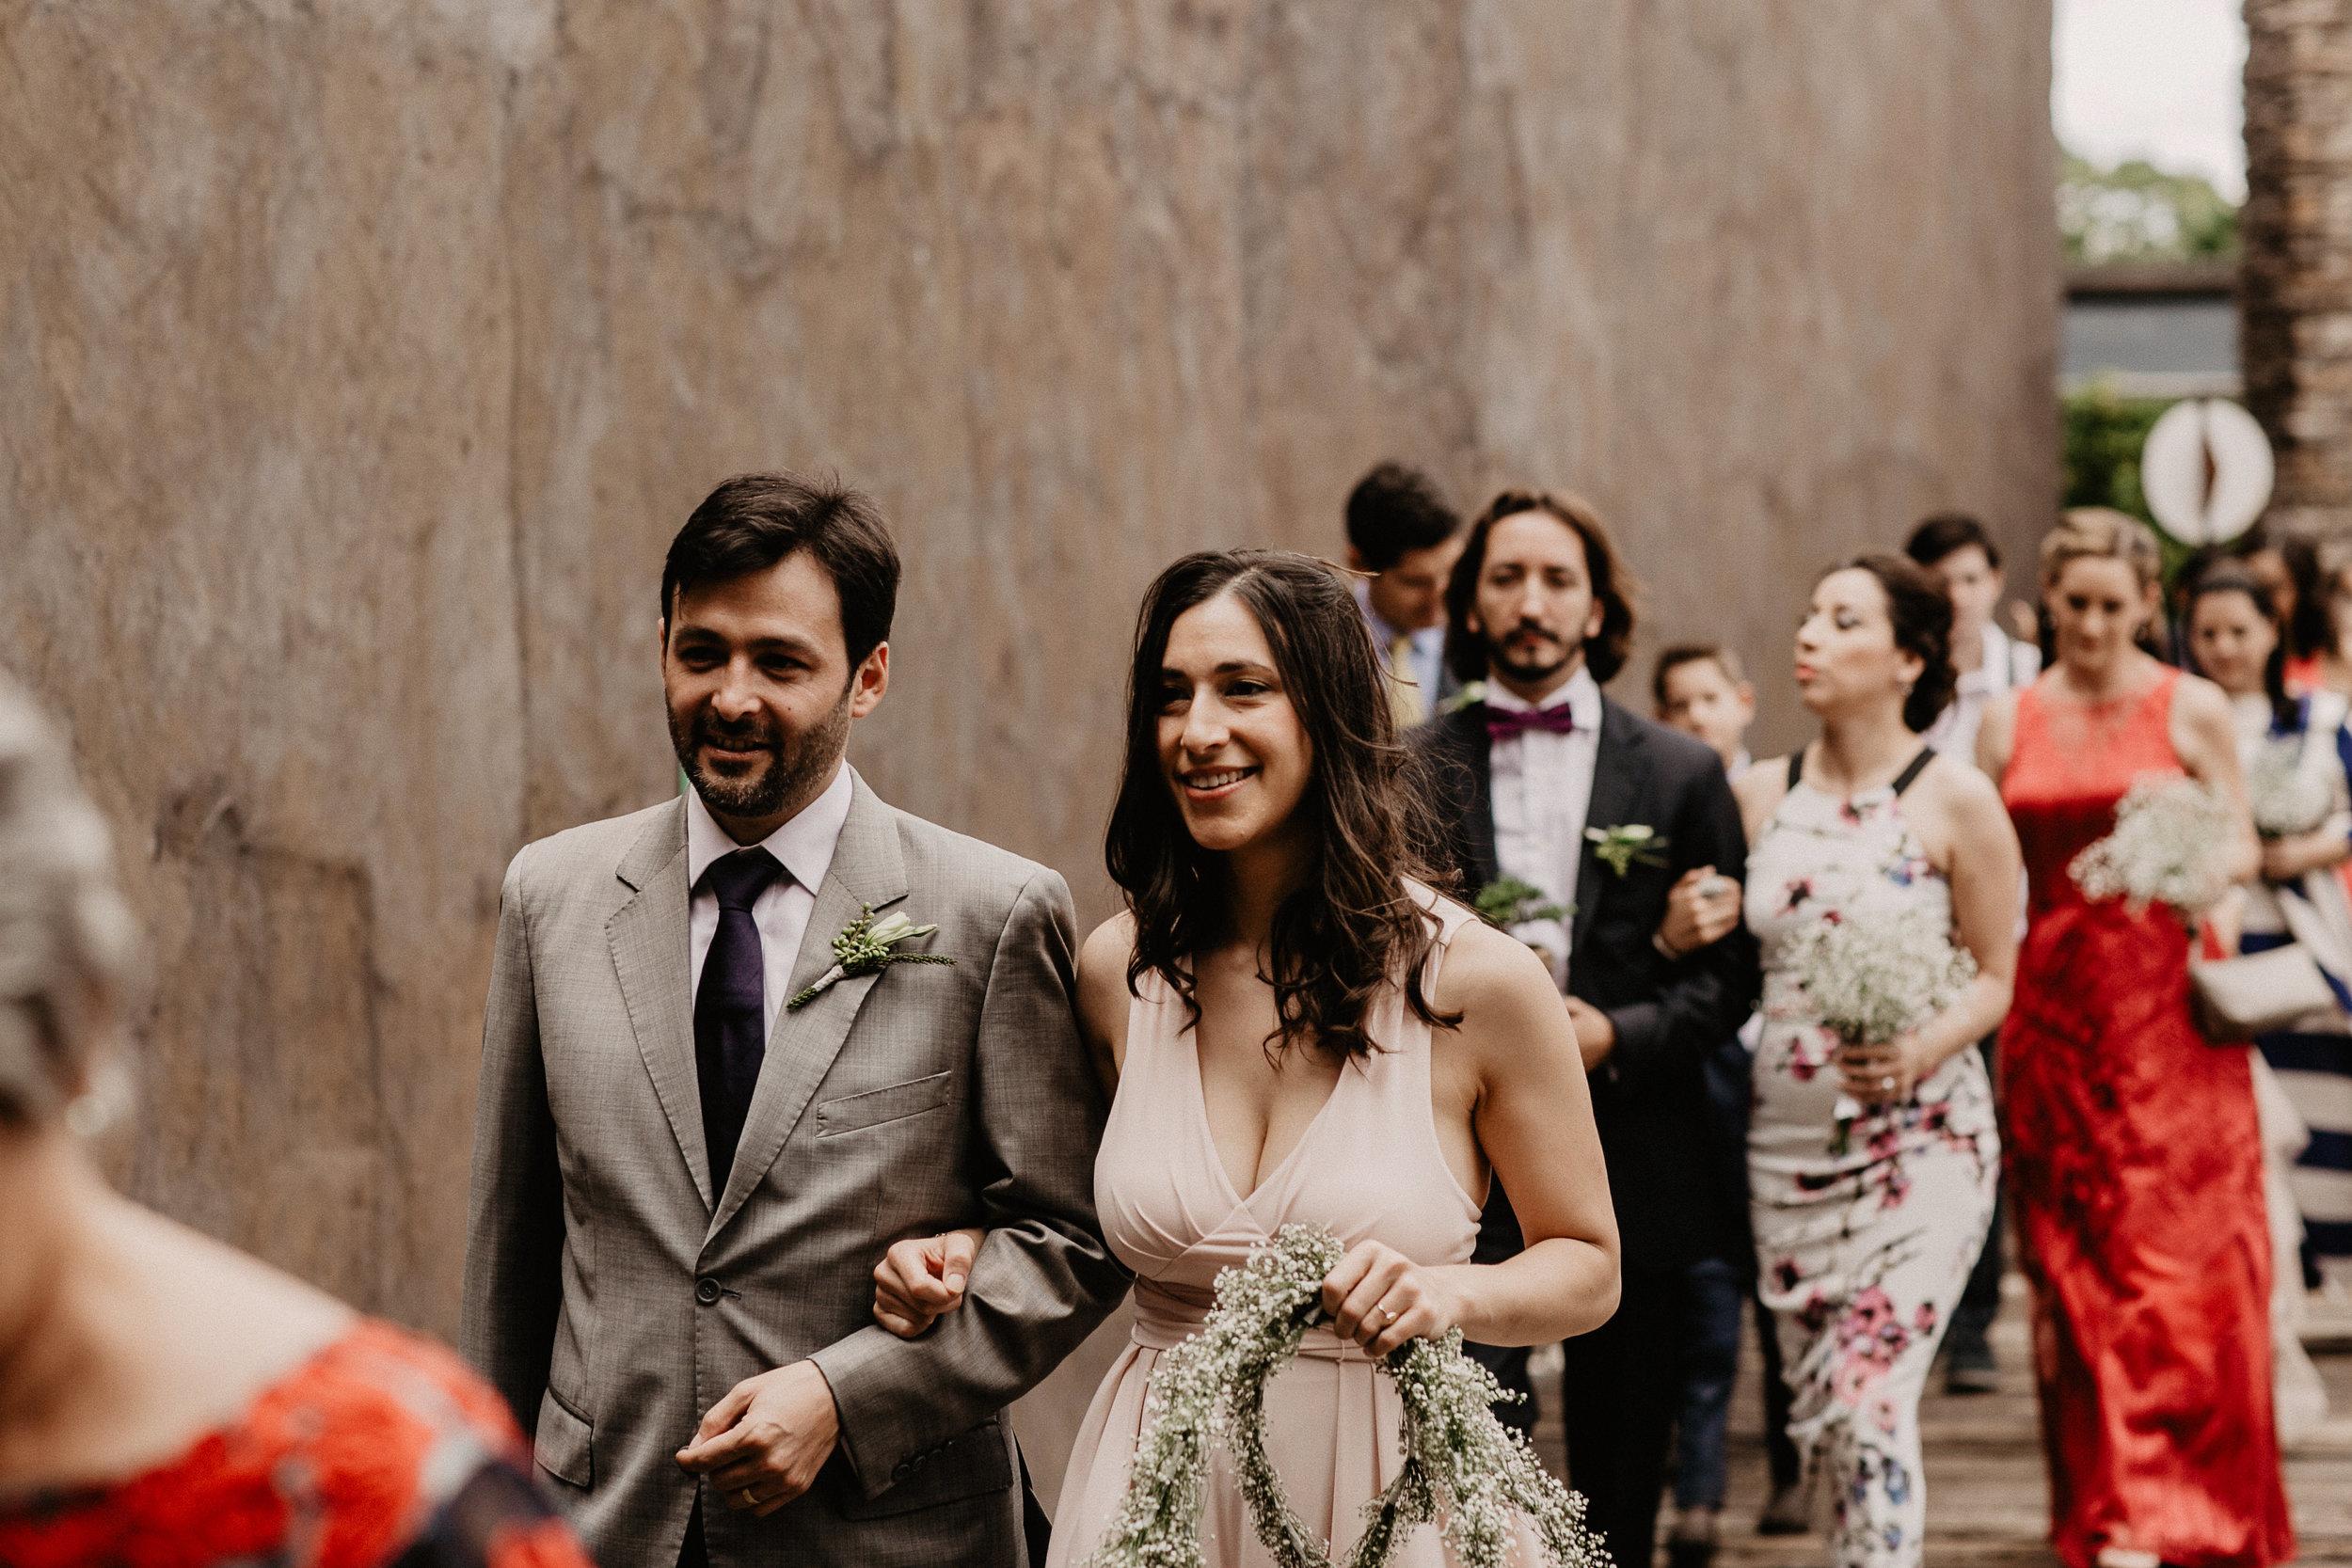 alfonso_flores_destination_wedding_photographer_pau_alonso_340.JPG